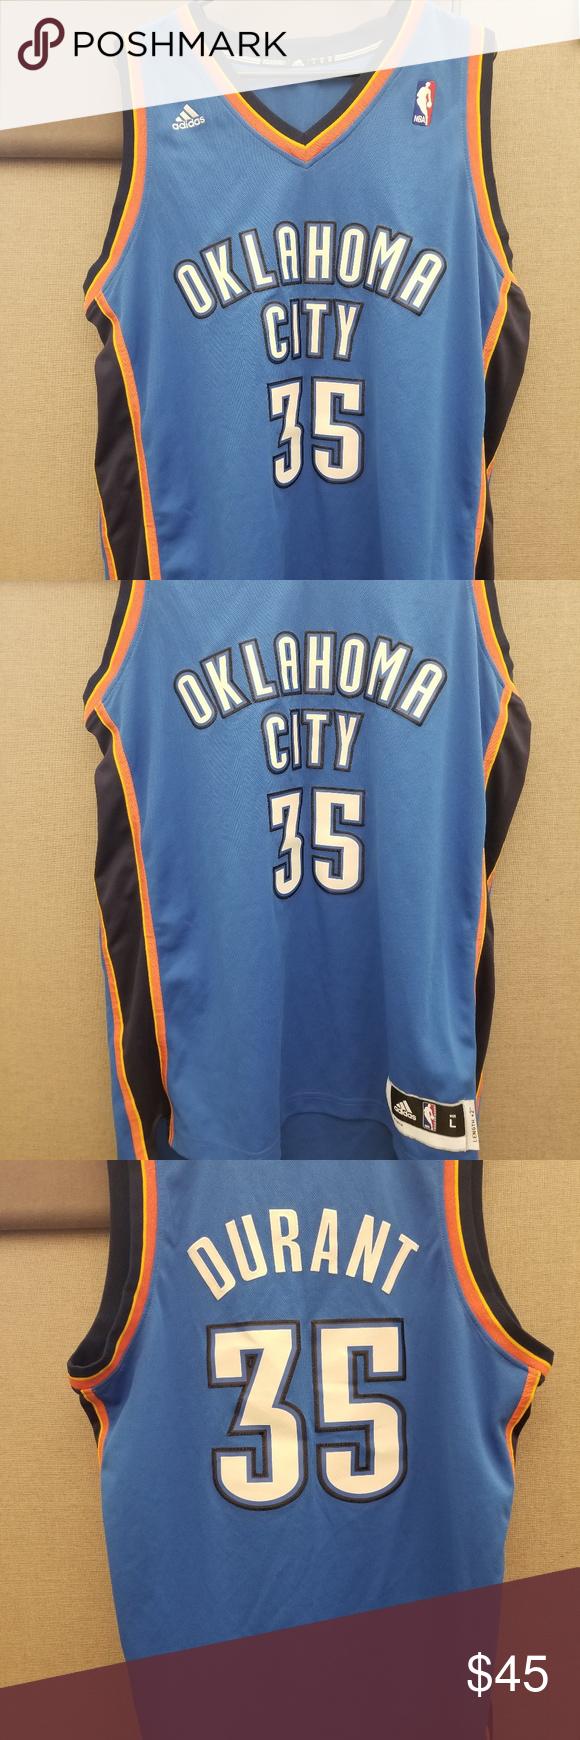 huge discount 8e1ec a7b9e Kevin Durant Oklahoma City Thunder jersey. Throwback Kevin ...